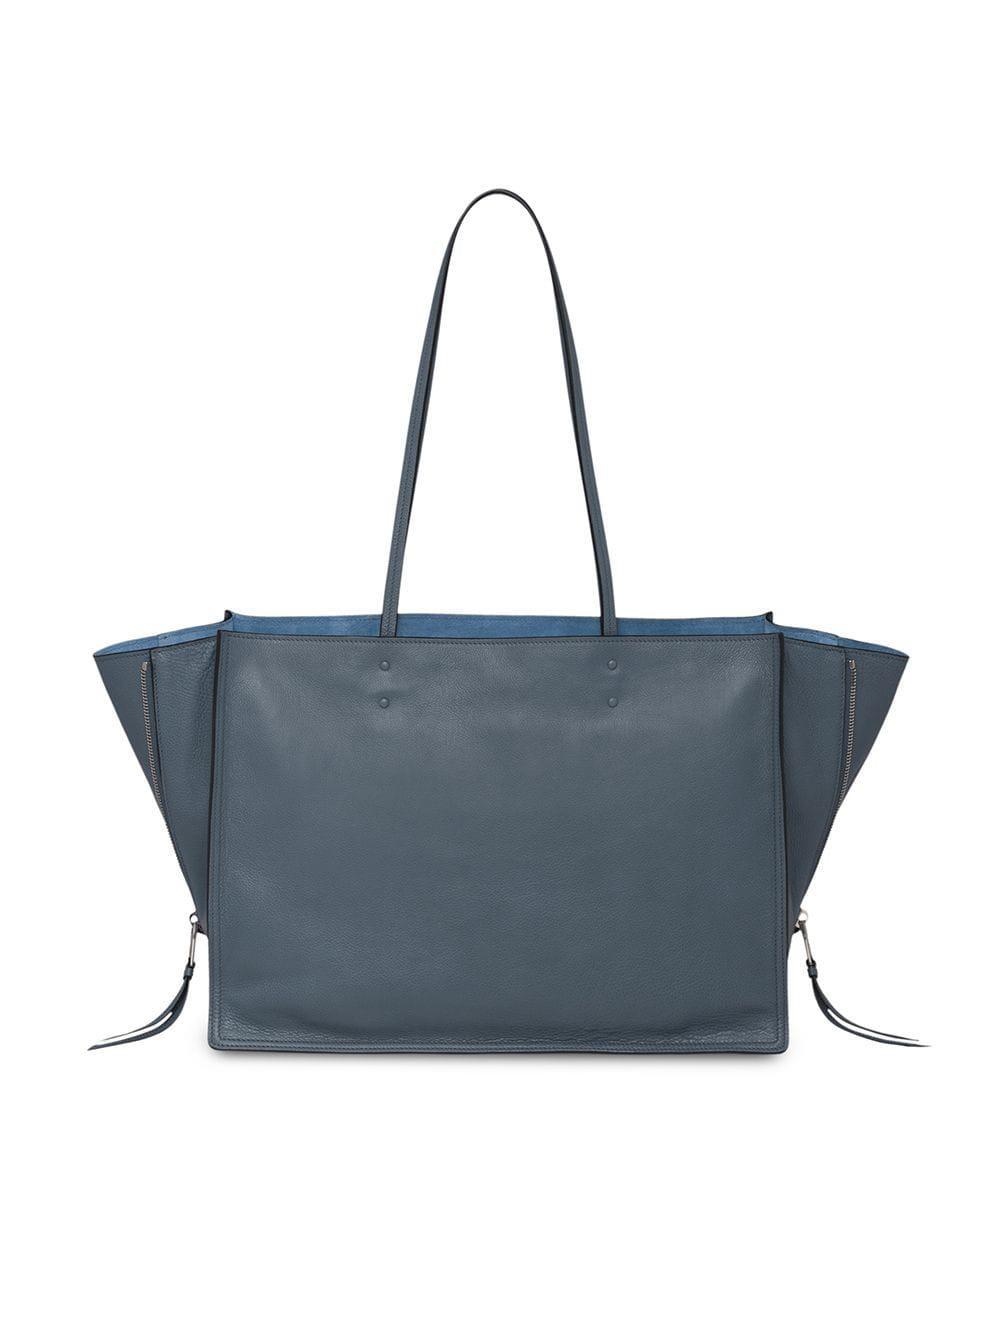 ba360bf670cc Lyst - Prada Etiquette Bag in Blue